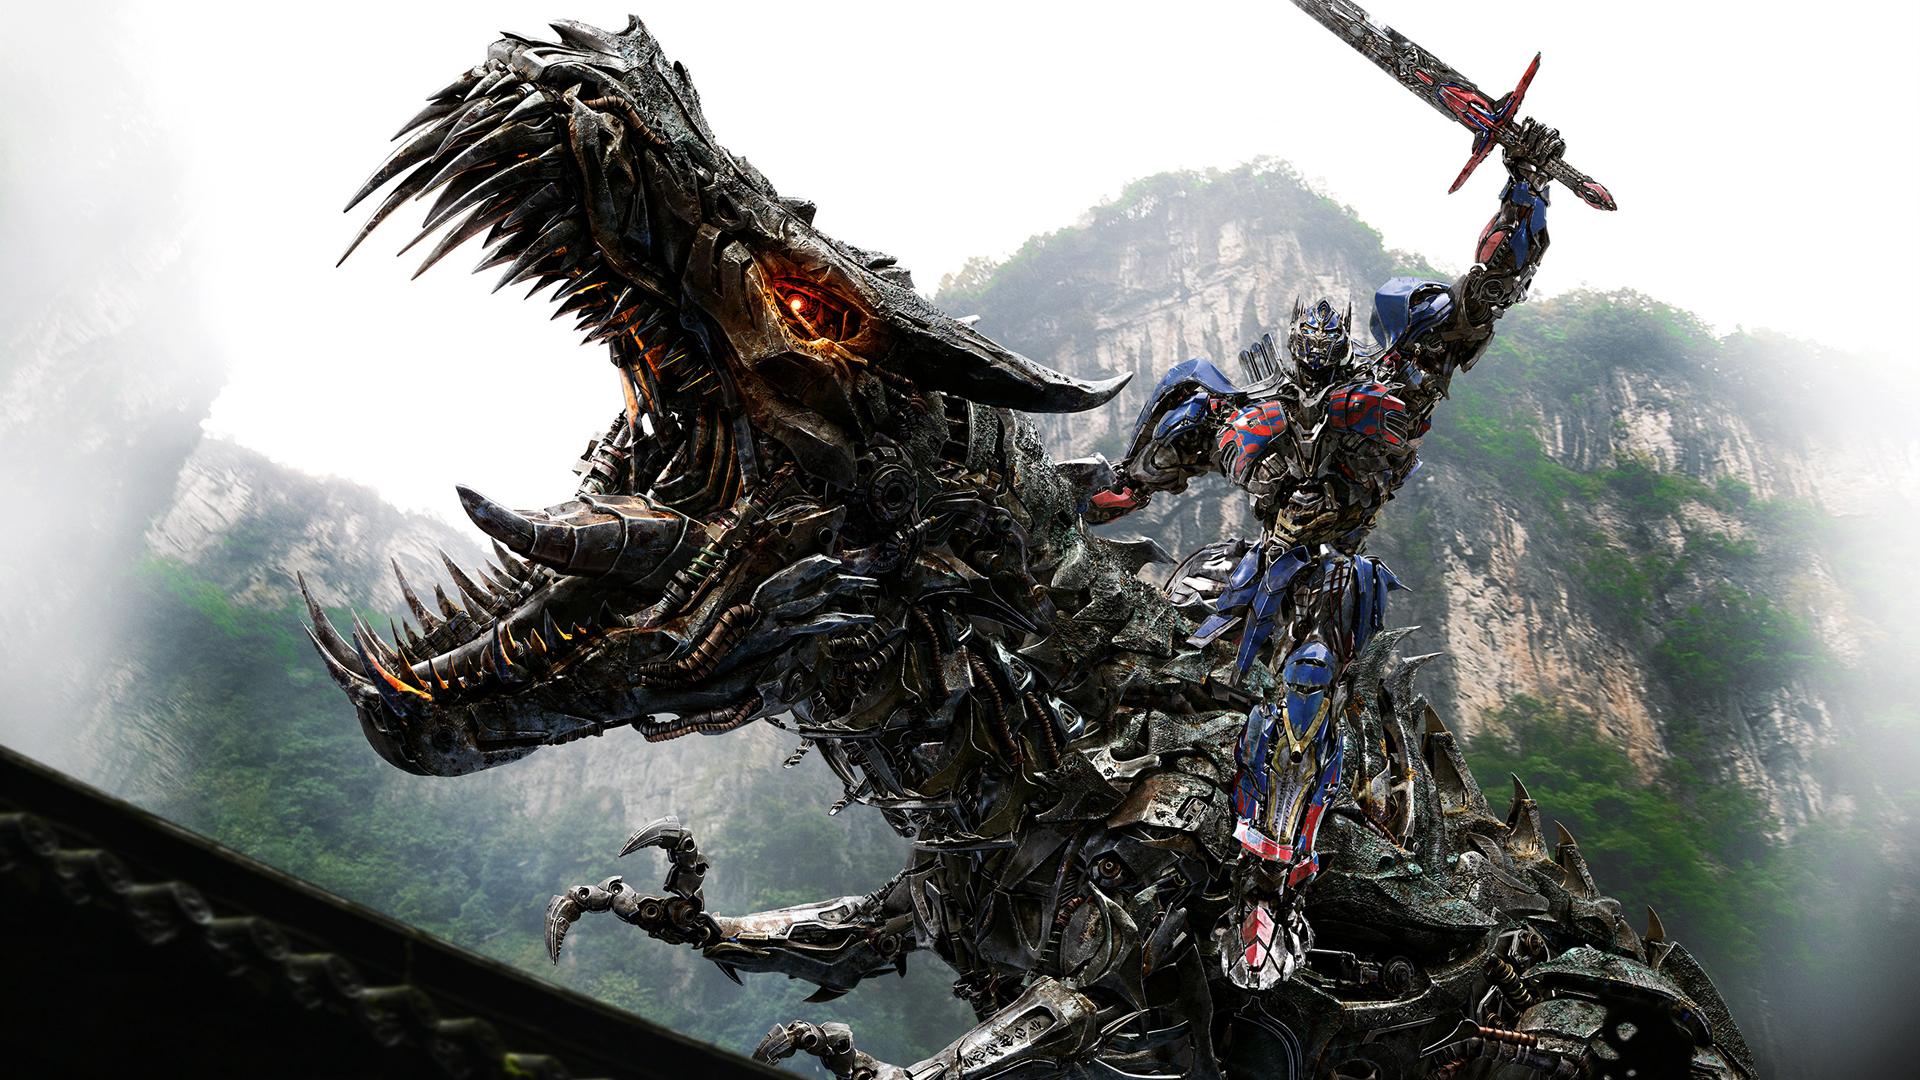 optimus prime transformers age of extinction 4 2014 action  adventure    Optimus Prime Transformers 4 Wallpaper